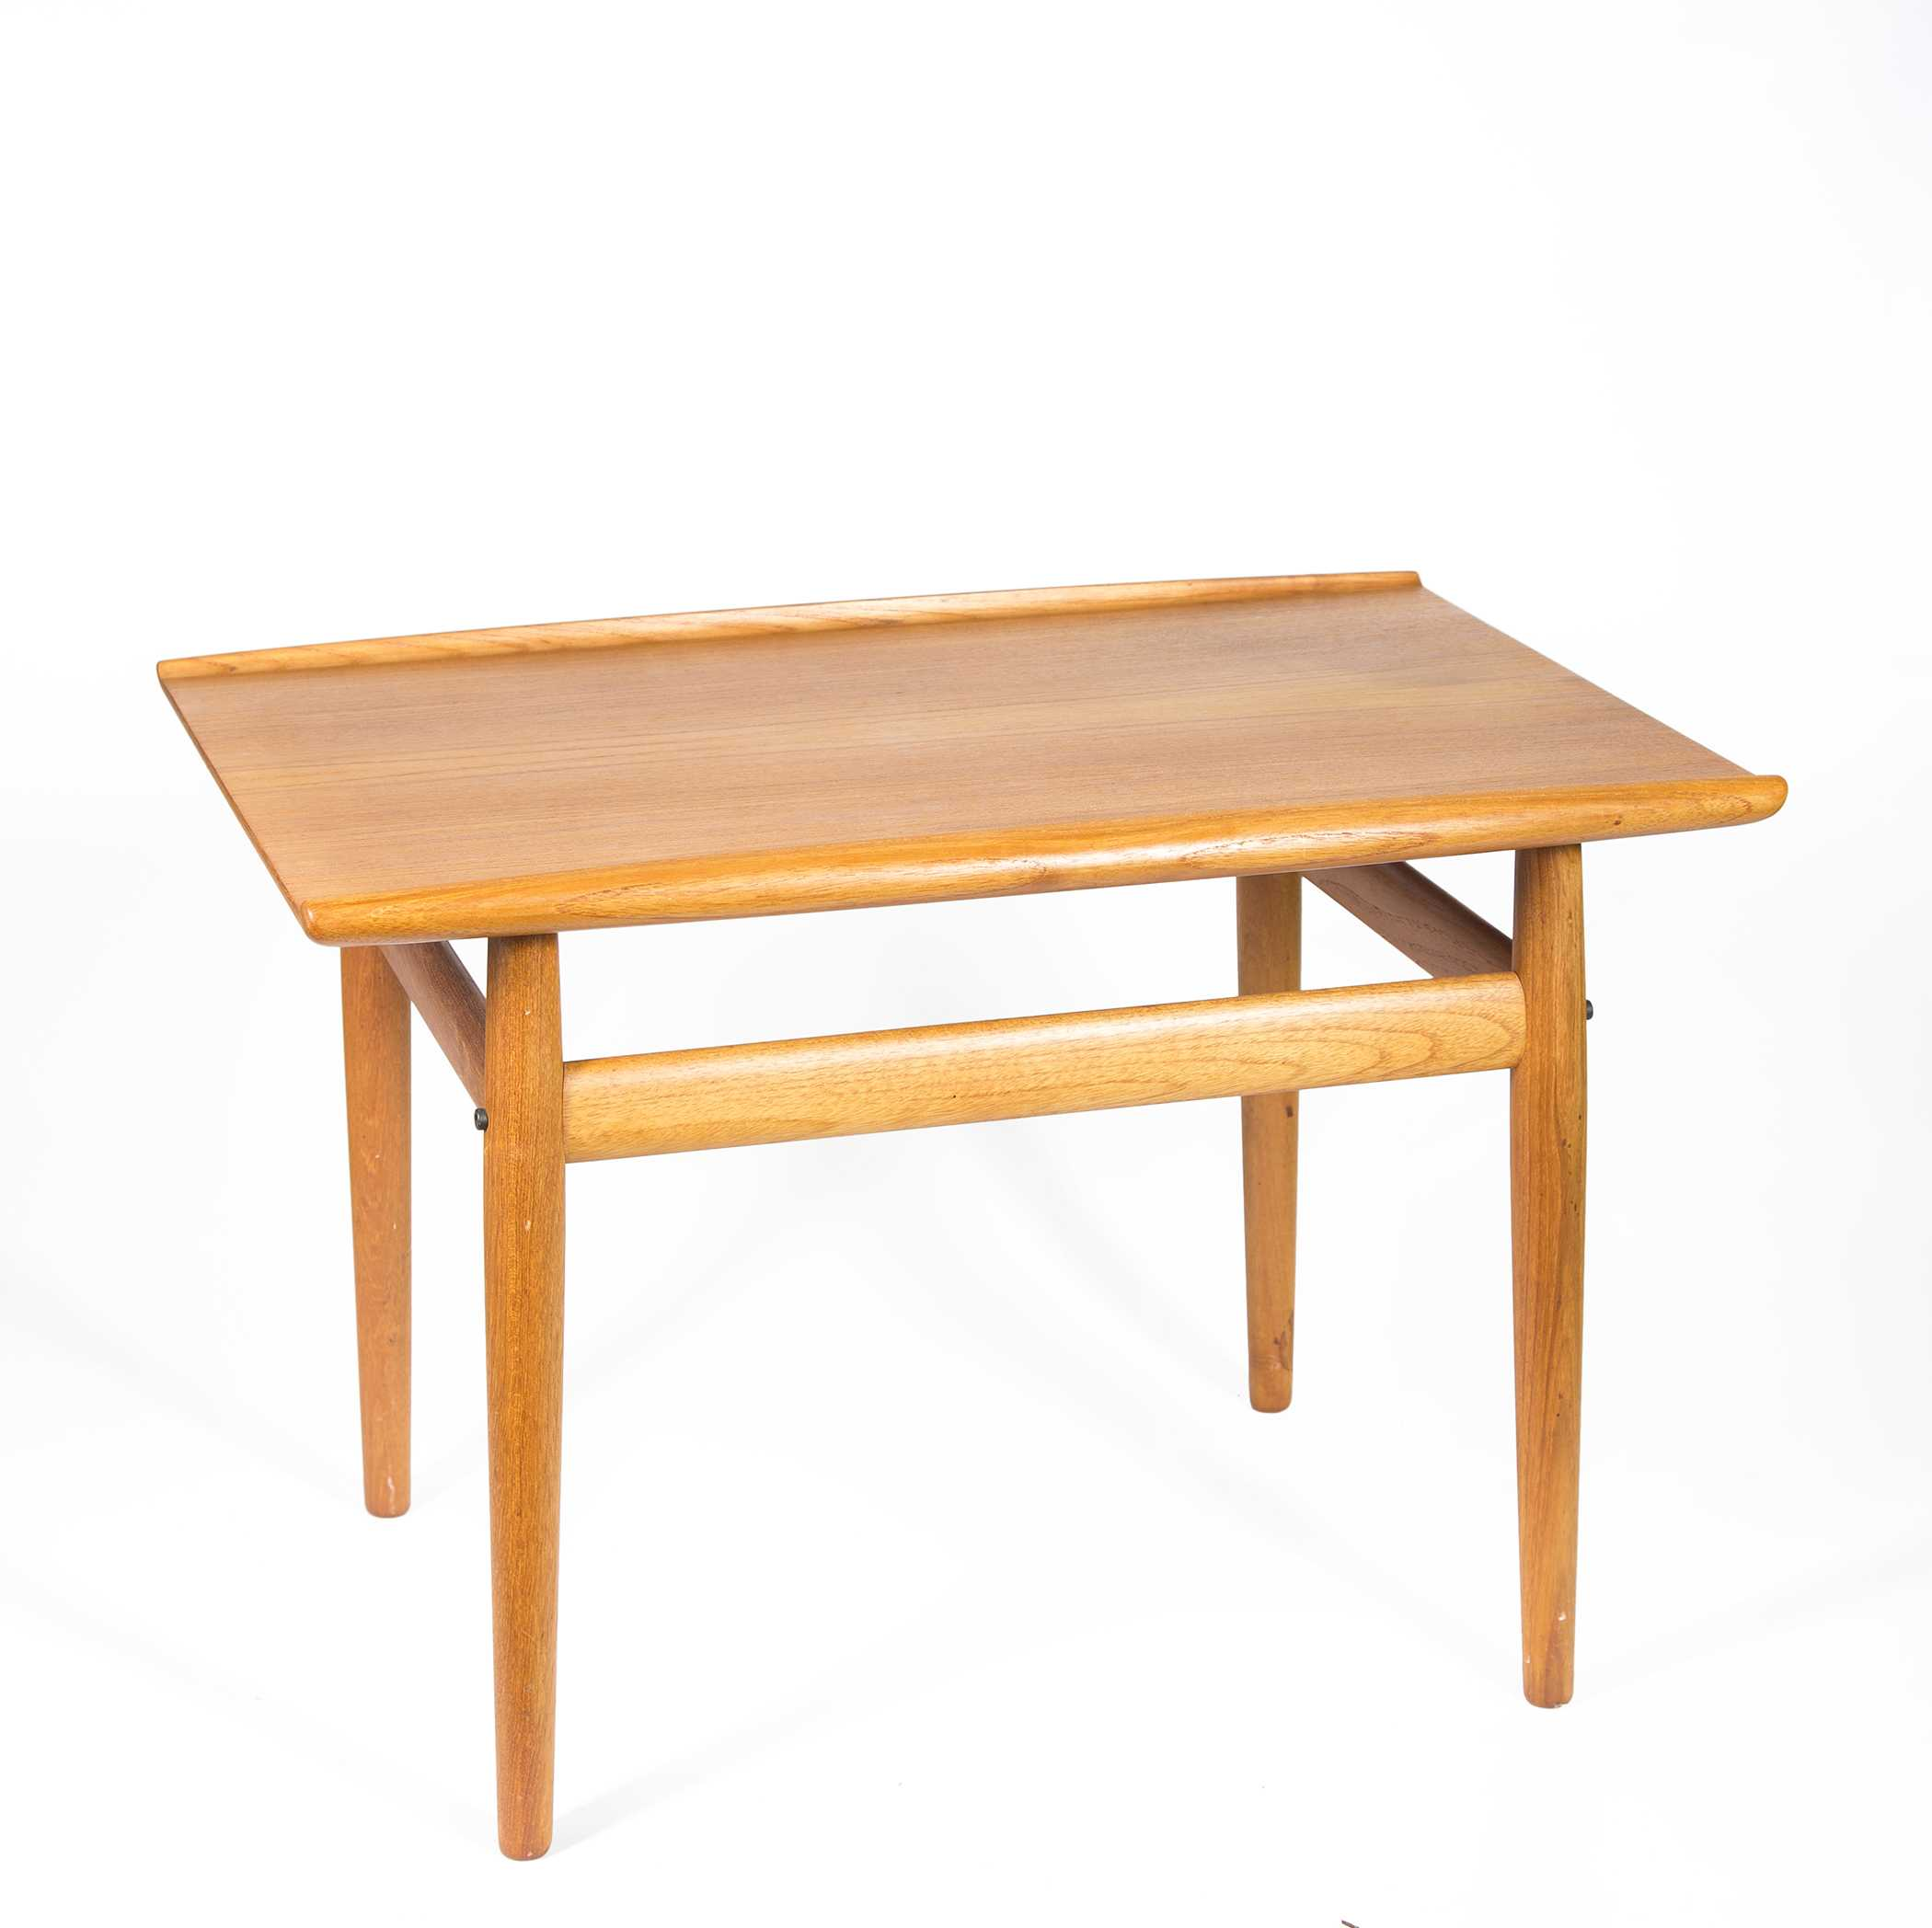 Two Danish Modern Teak Wood Coffee Tables